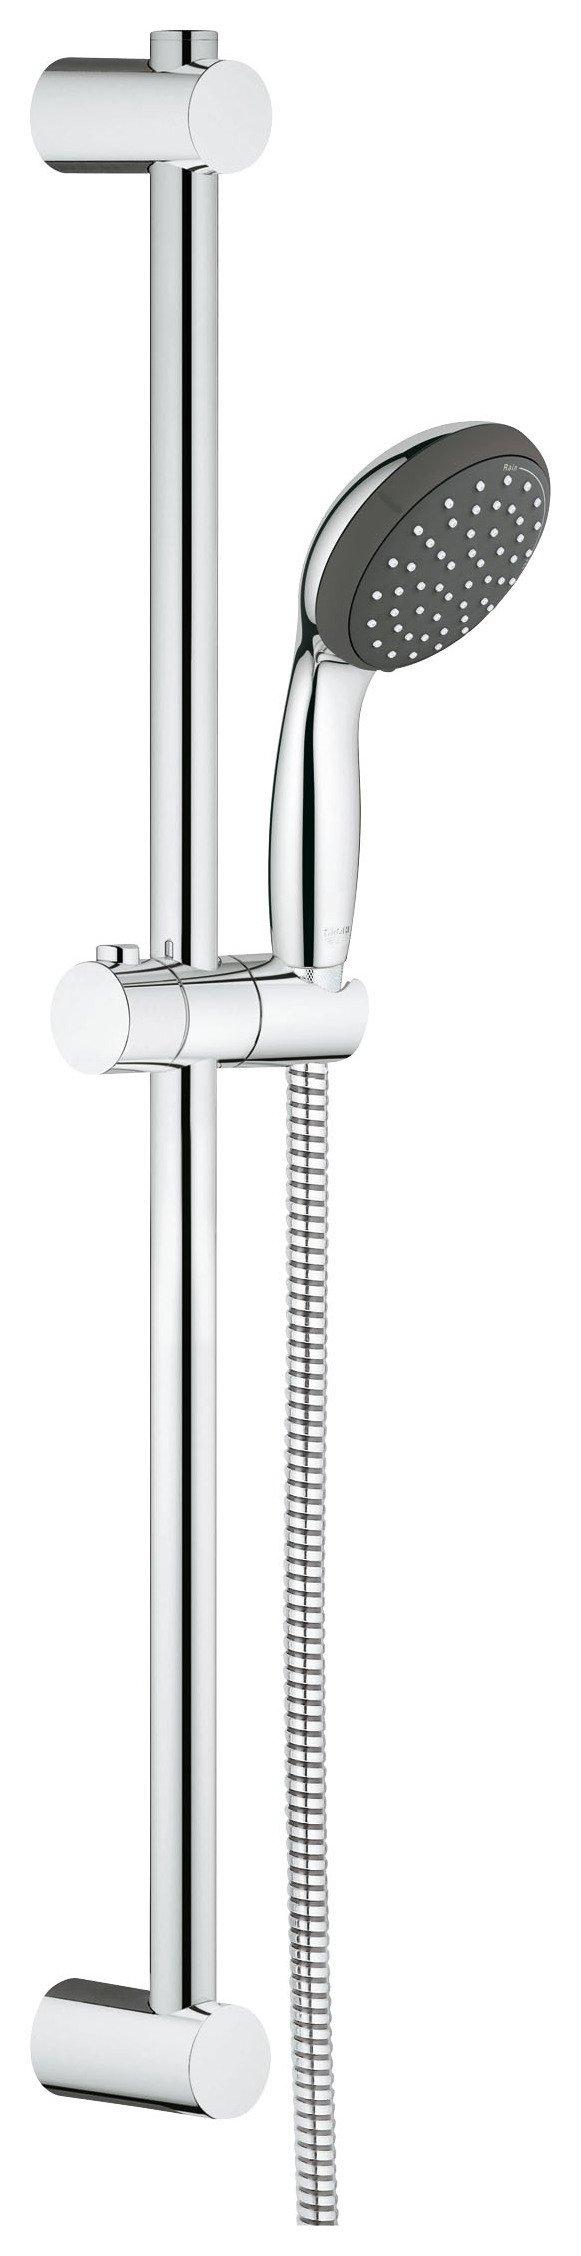 Grohe vitalio start 100 hand shower and rail for Grohe vitalio go 100